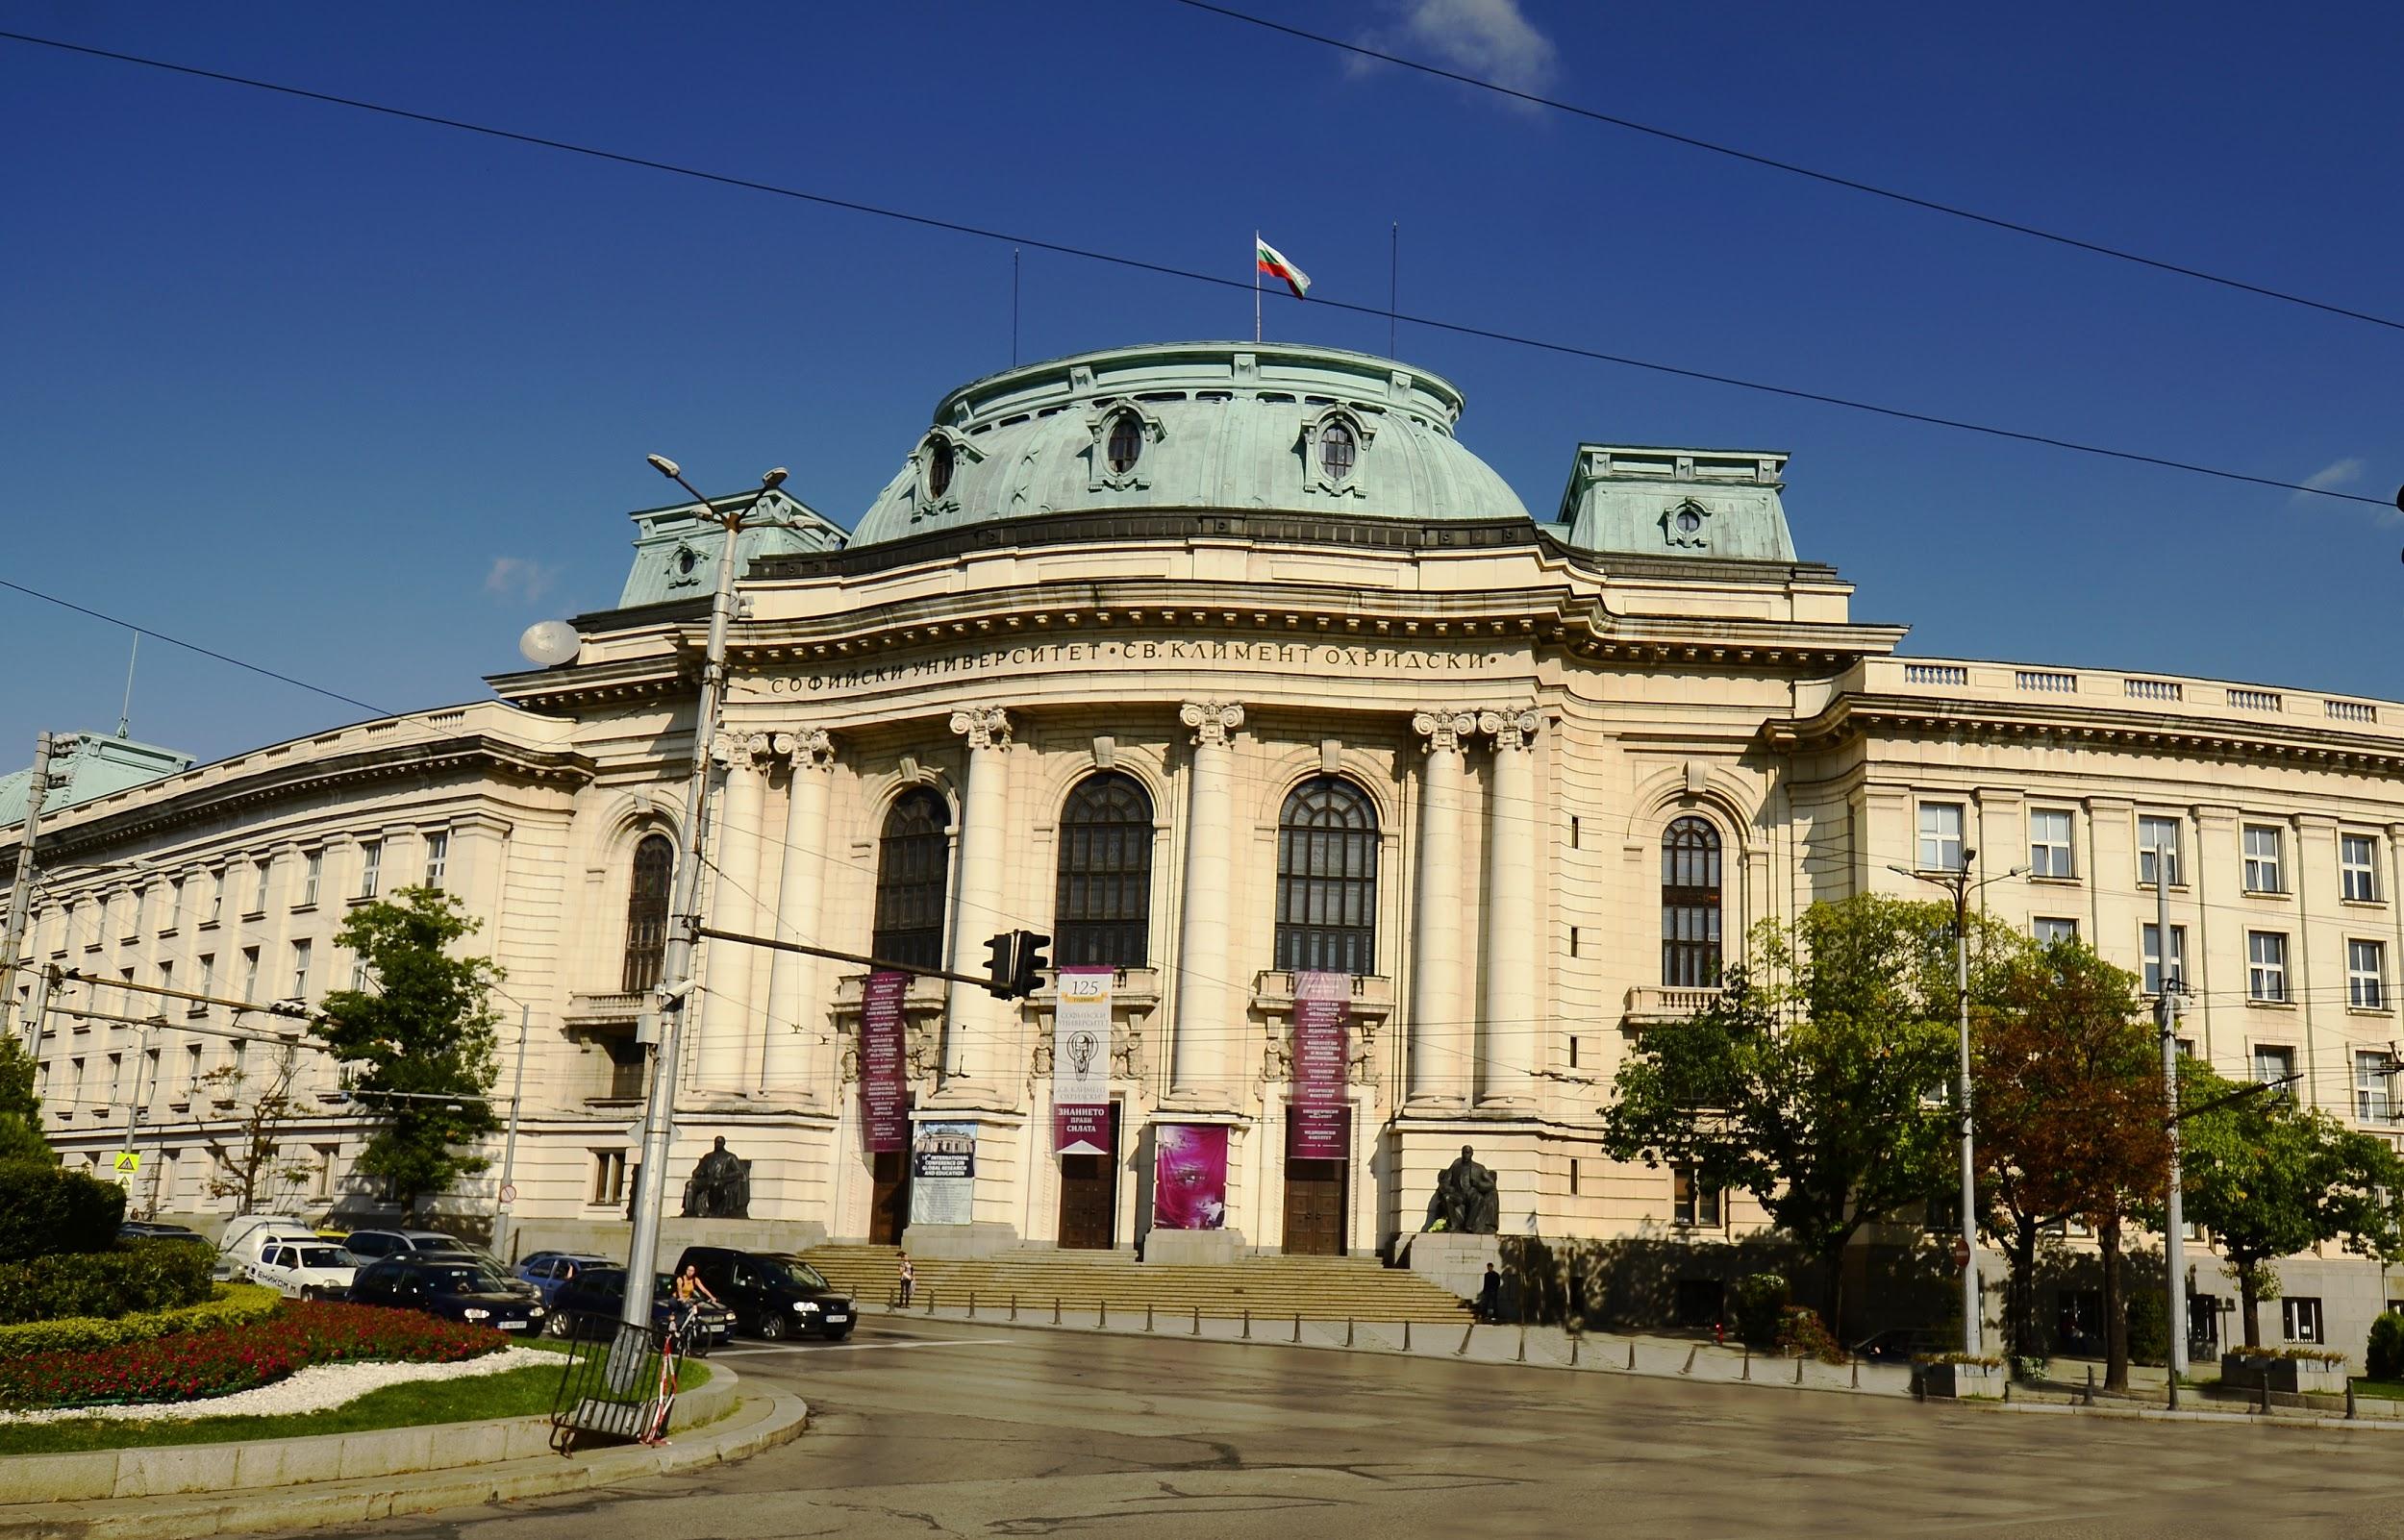 Sofia sightseeing location - Sofia University